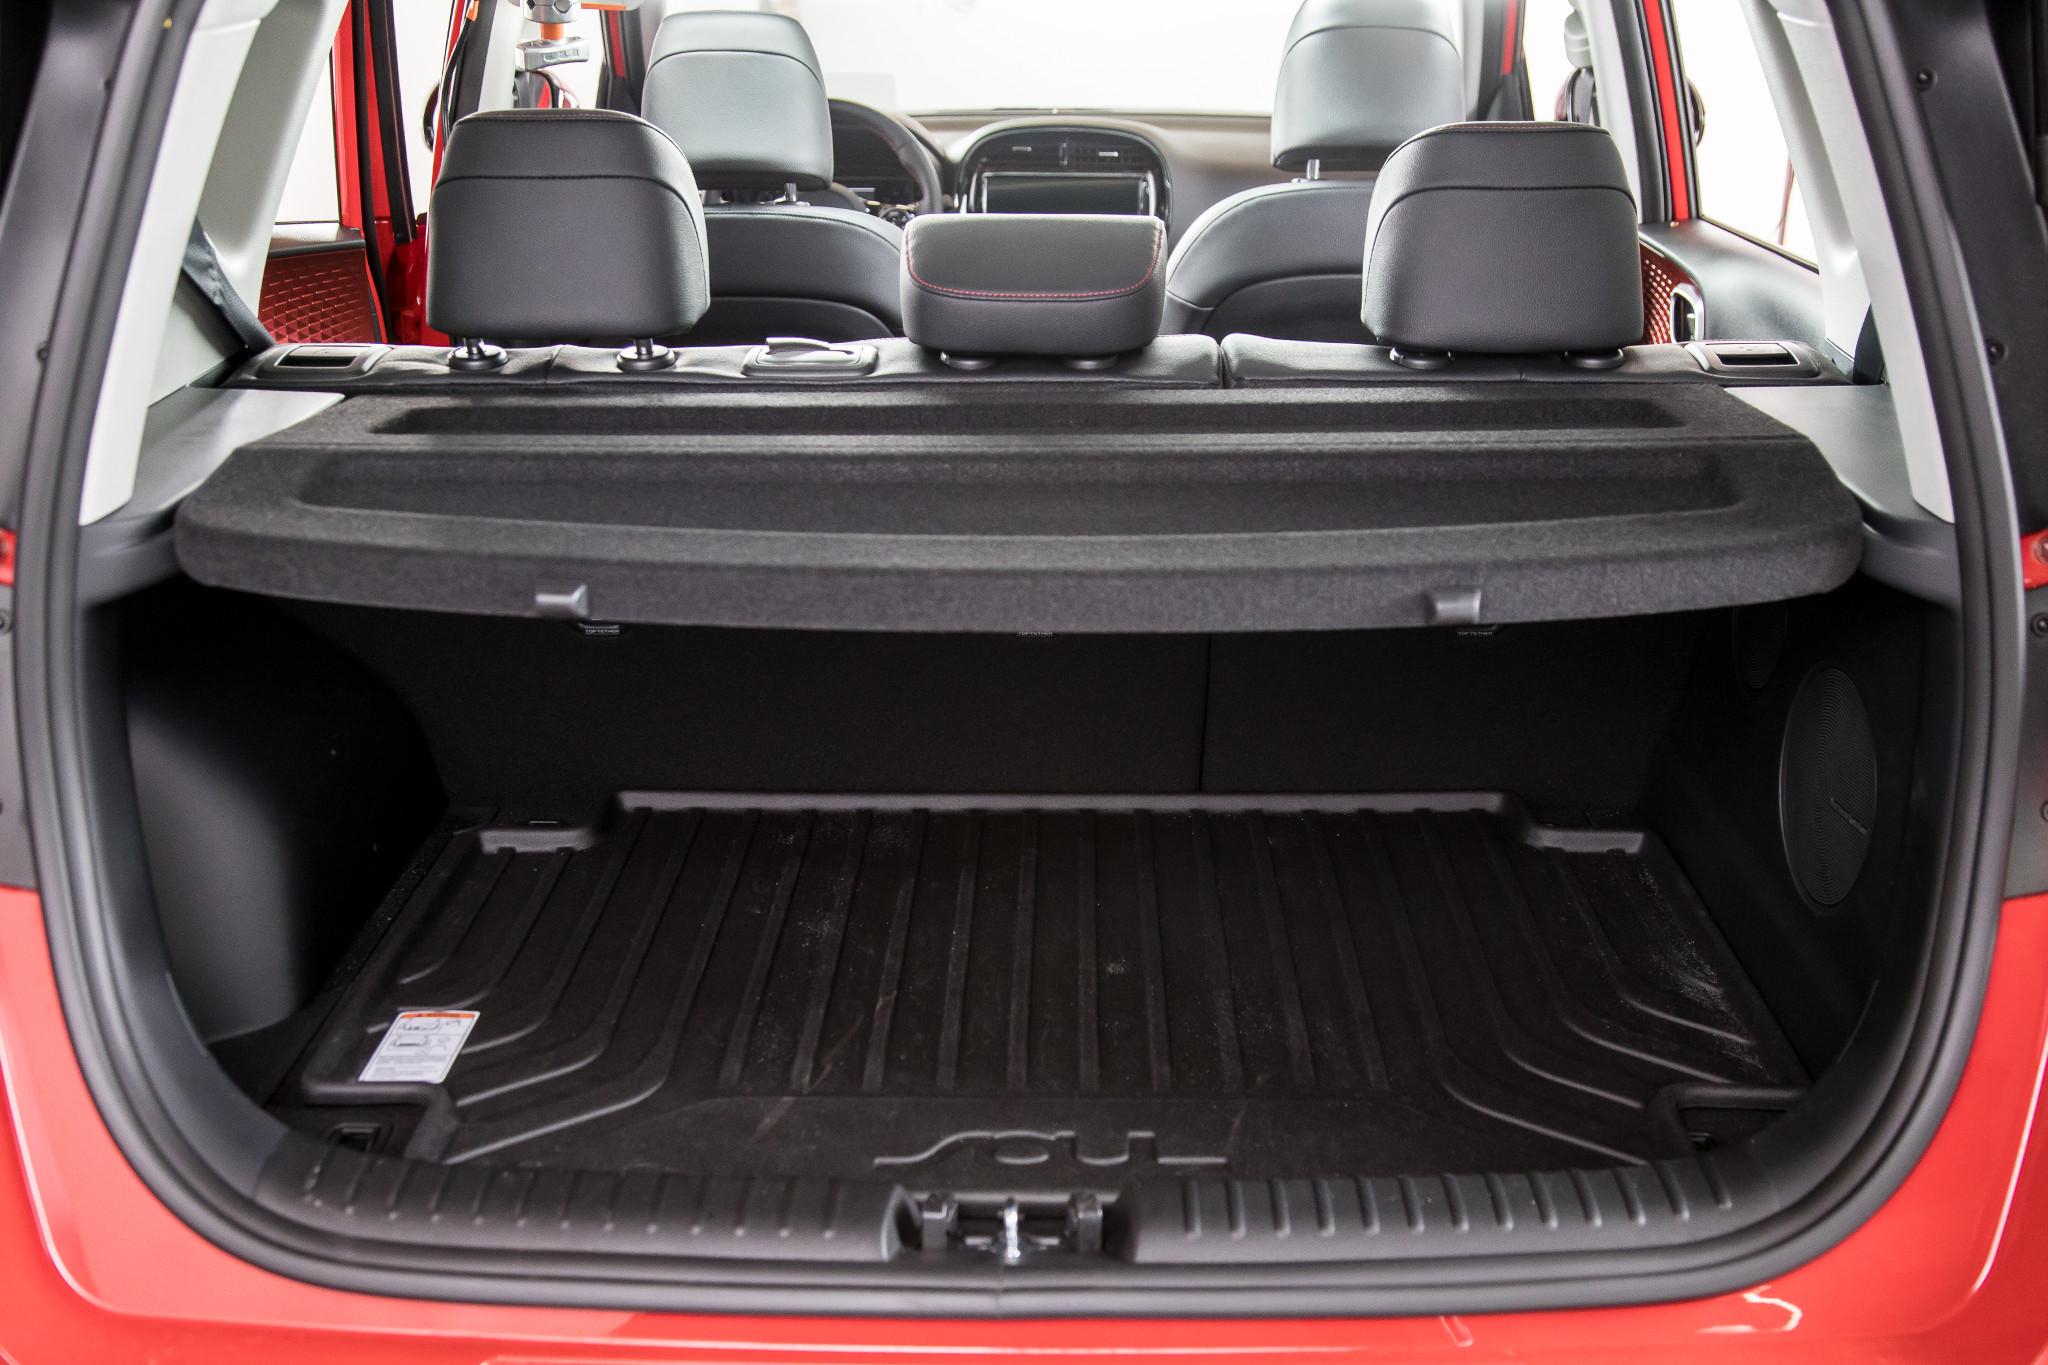 37-kia-soul-2020-interior--trunk.jpg